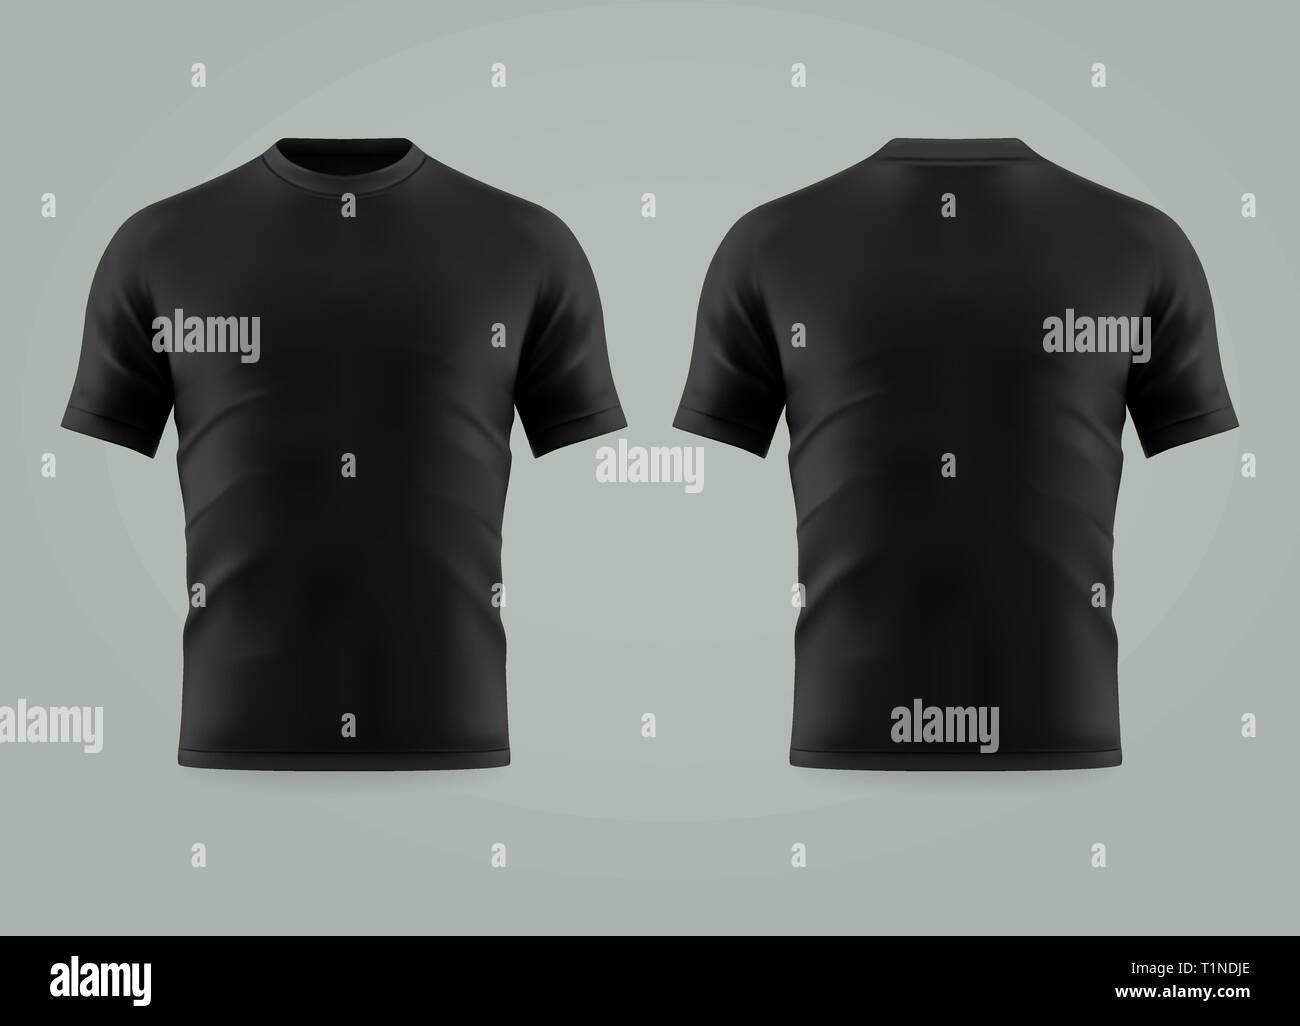 e3a8a1a40 3d or realistic black t-shirt or shirt wear Stock Vector Art ...